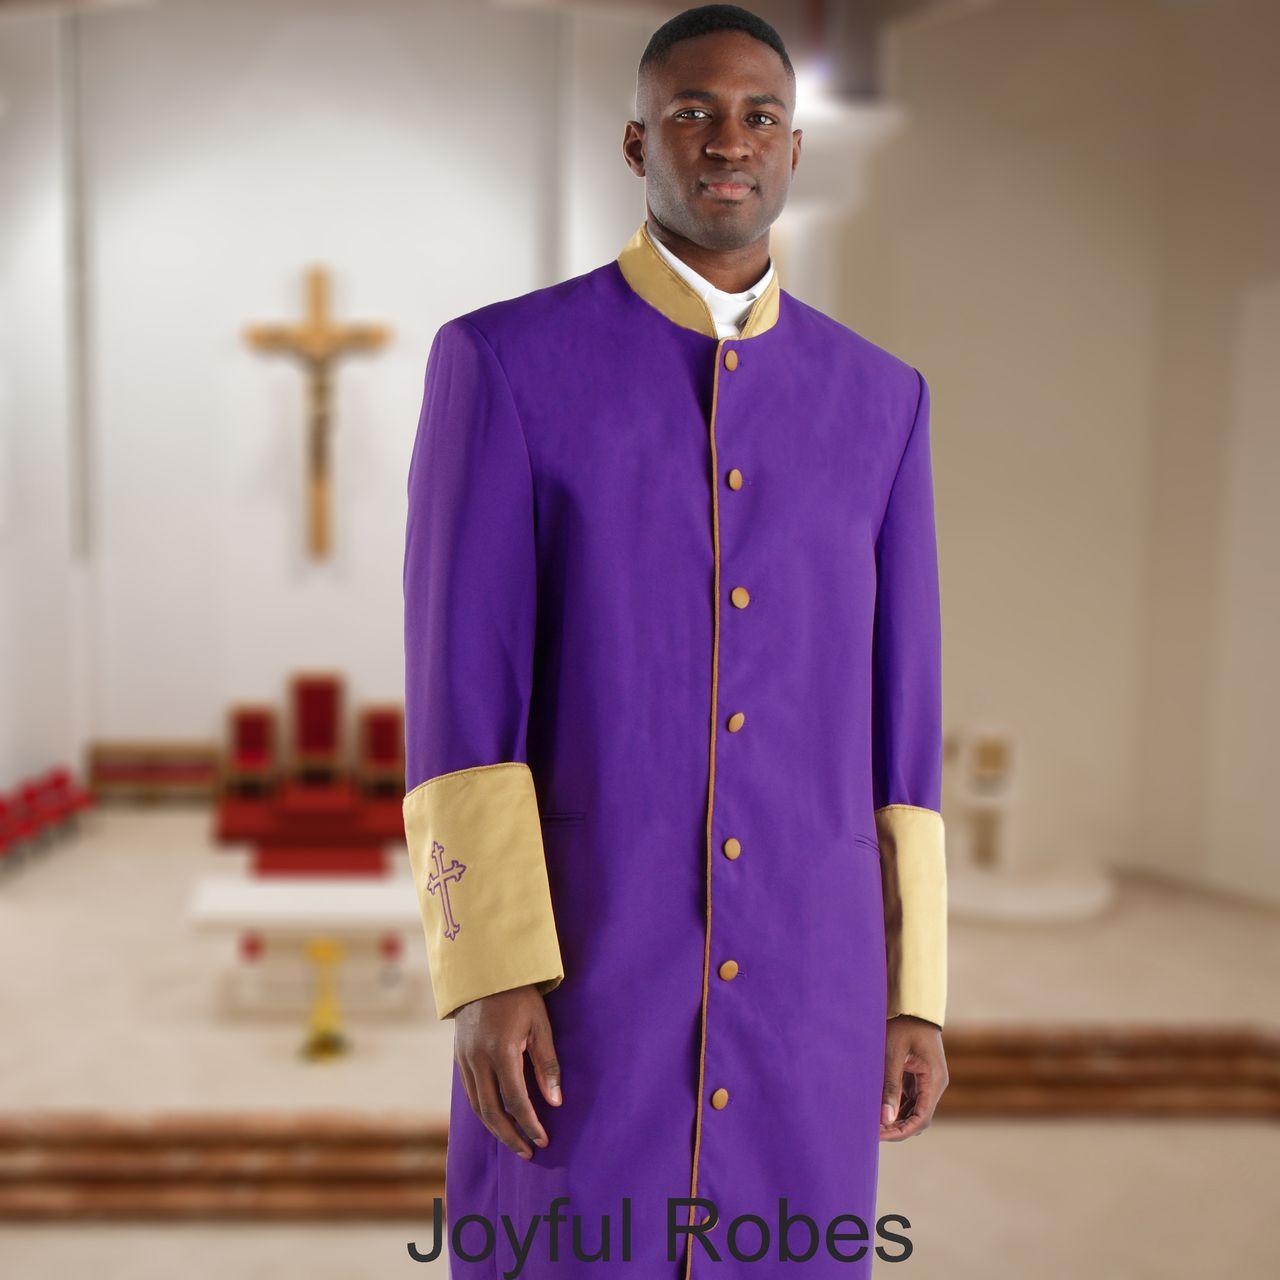 302 M. Men's Pastor/Clergy Robe - Purple/Gold Cuff